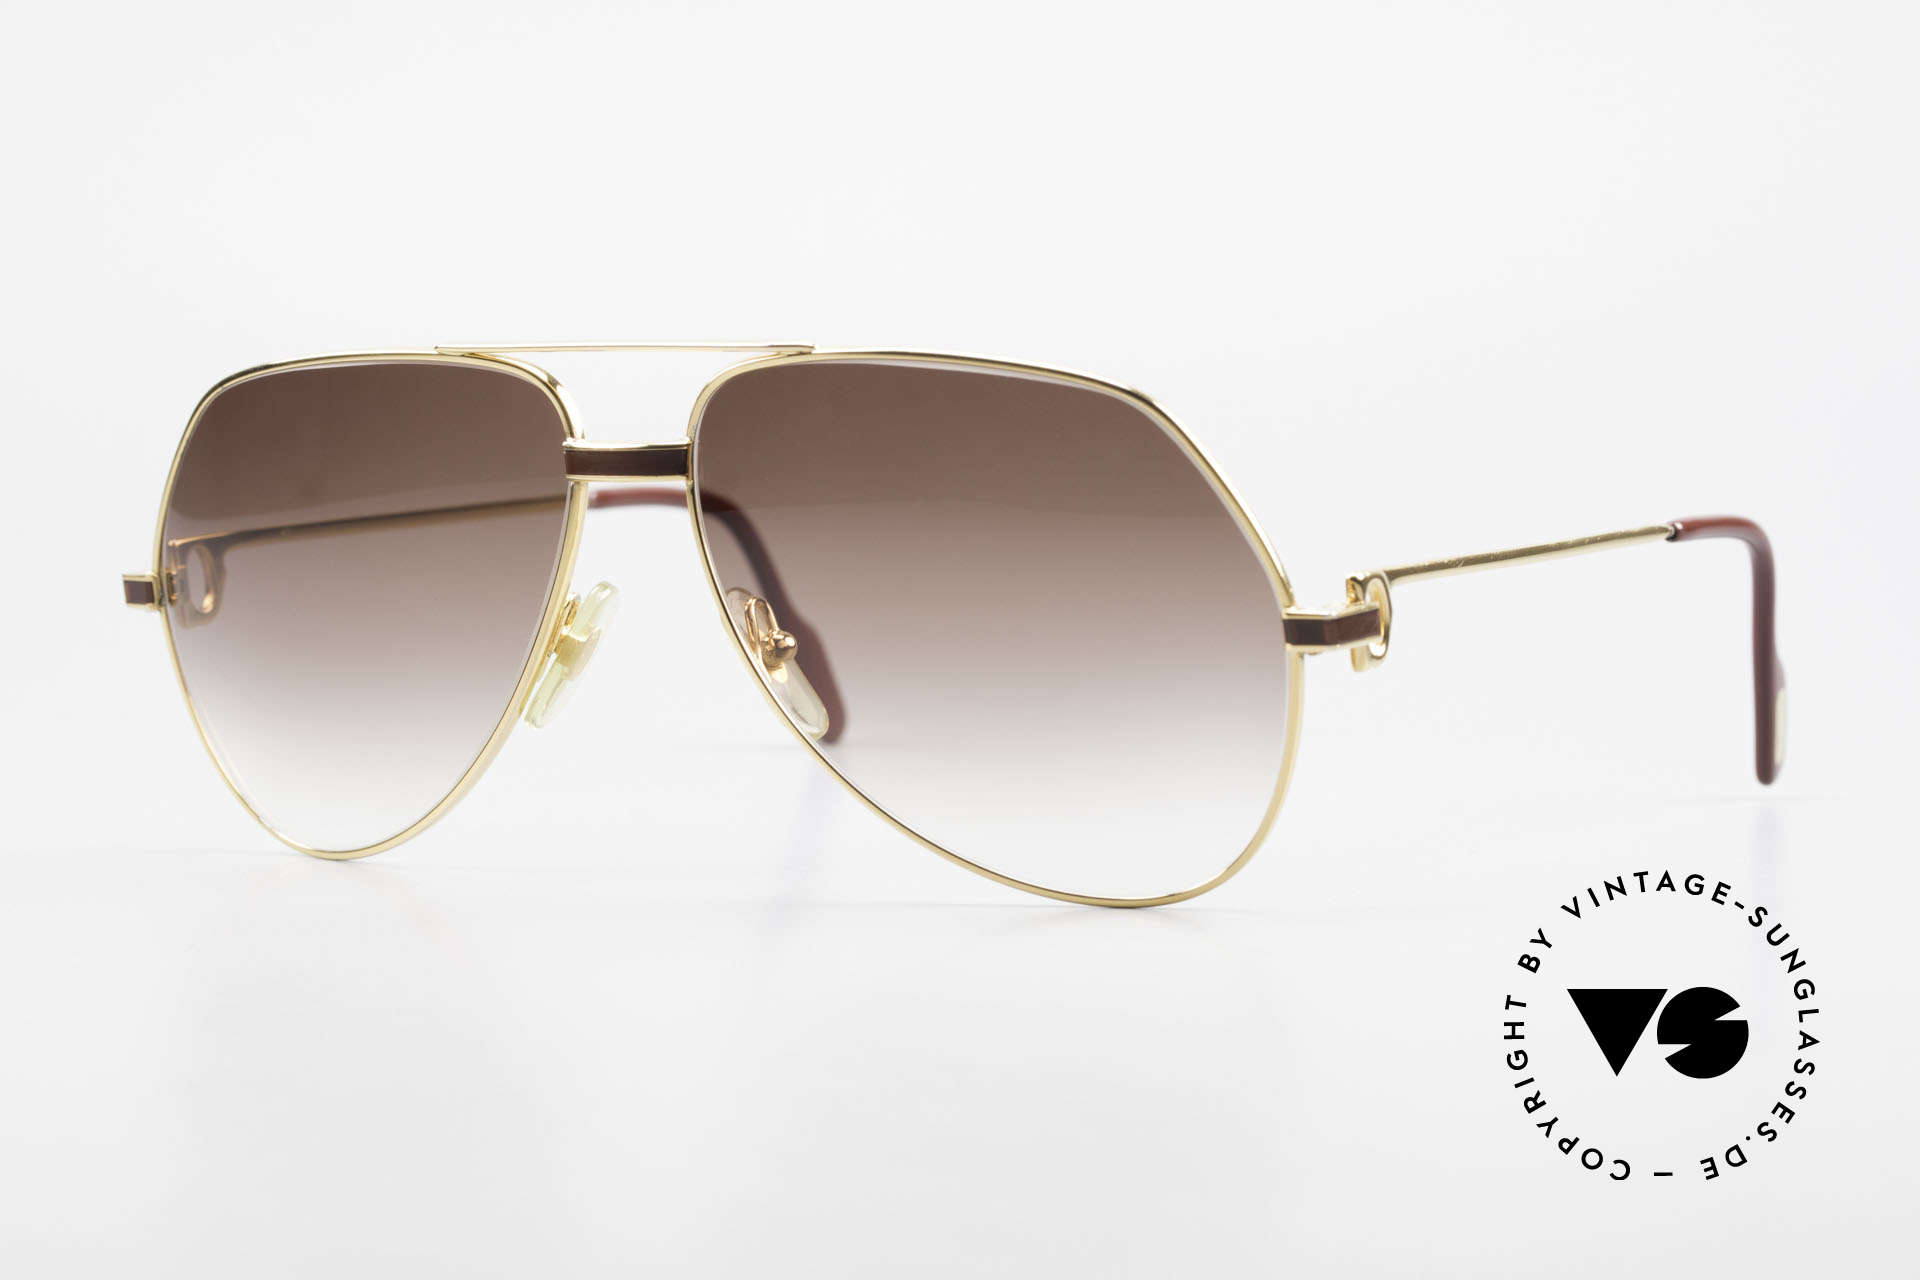 Cartier Vendome Laque - L Luxury Aviator Sunglasses, Vendome = the most famous eyewear design by CARTIER, Made for Men